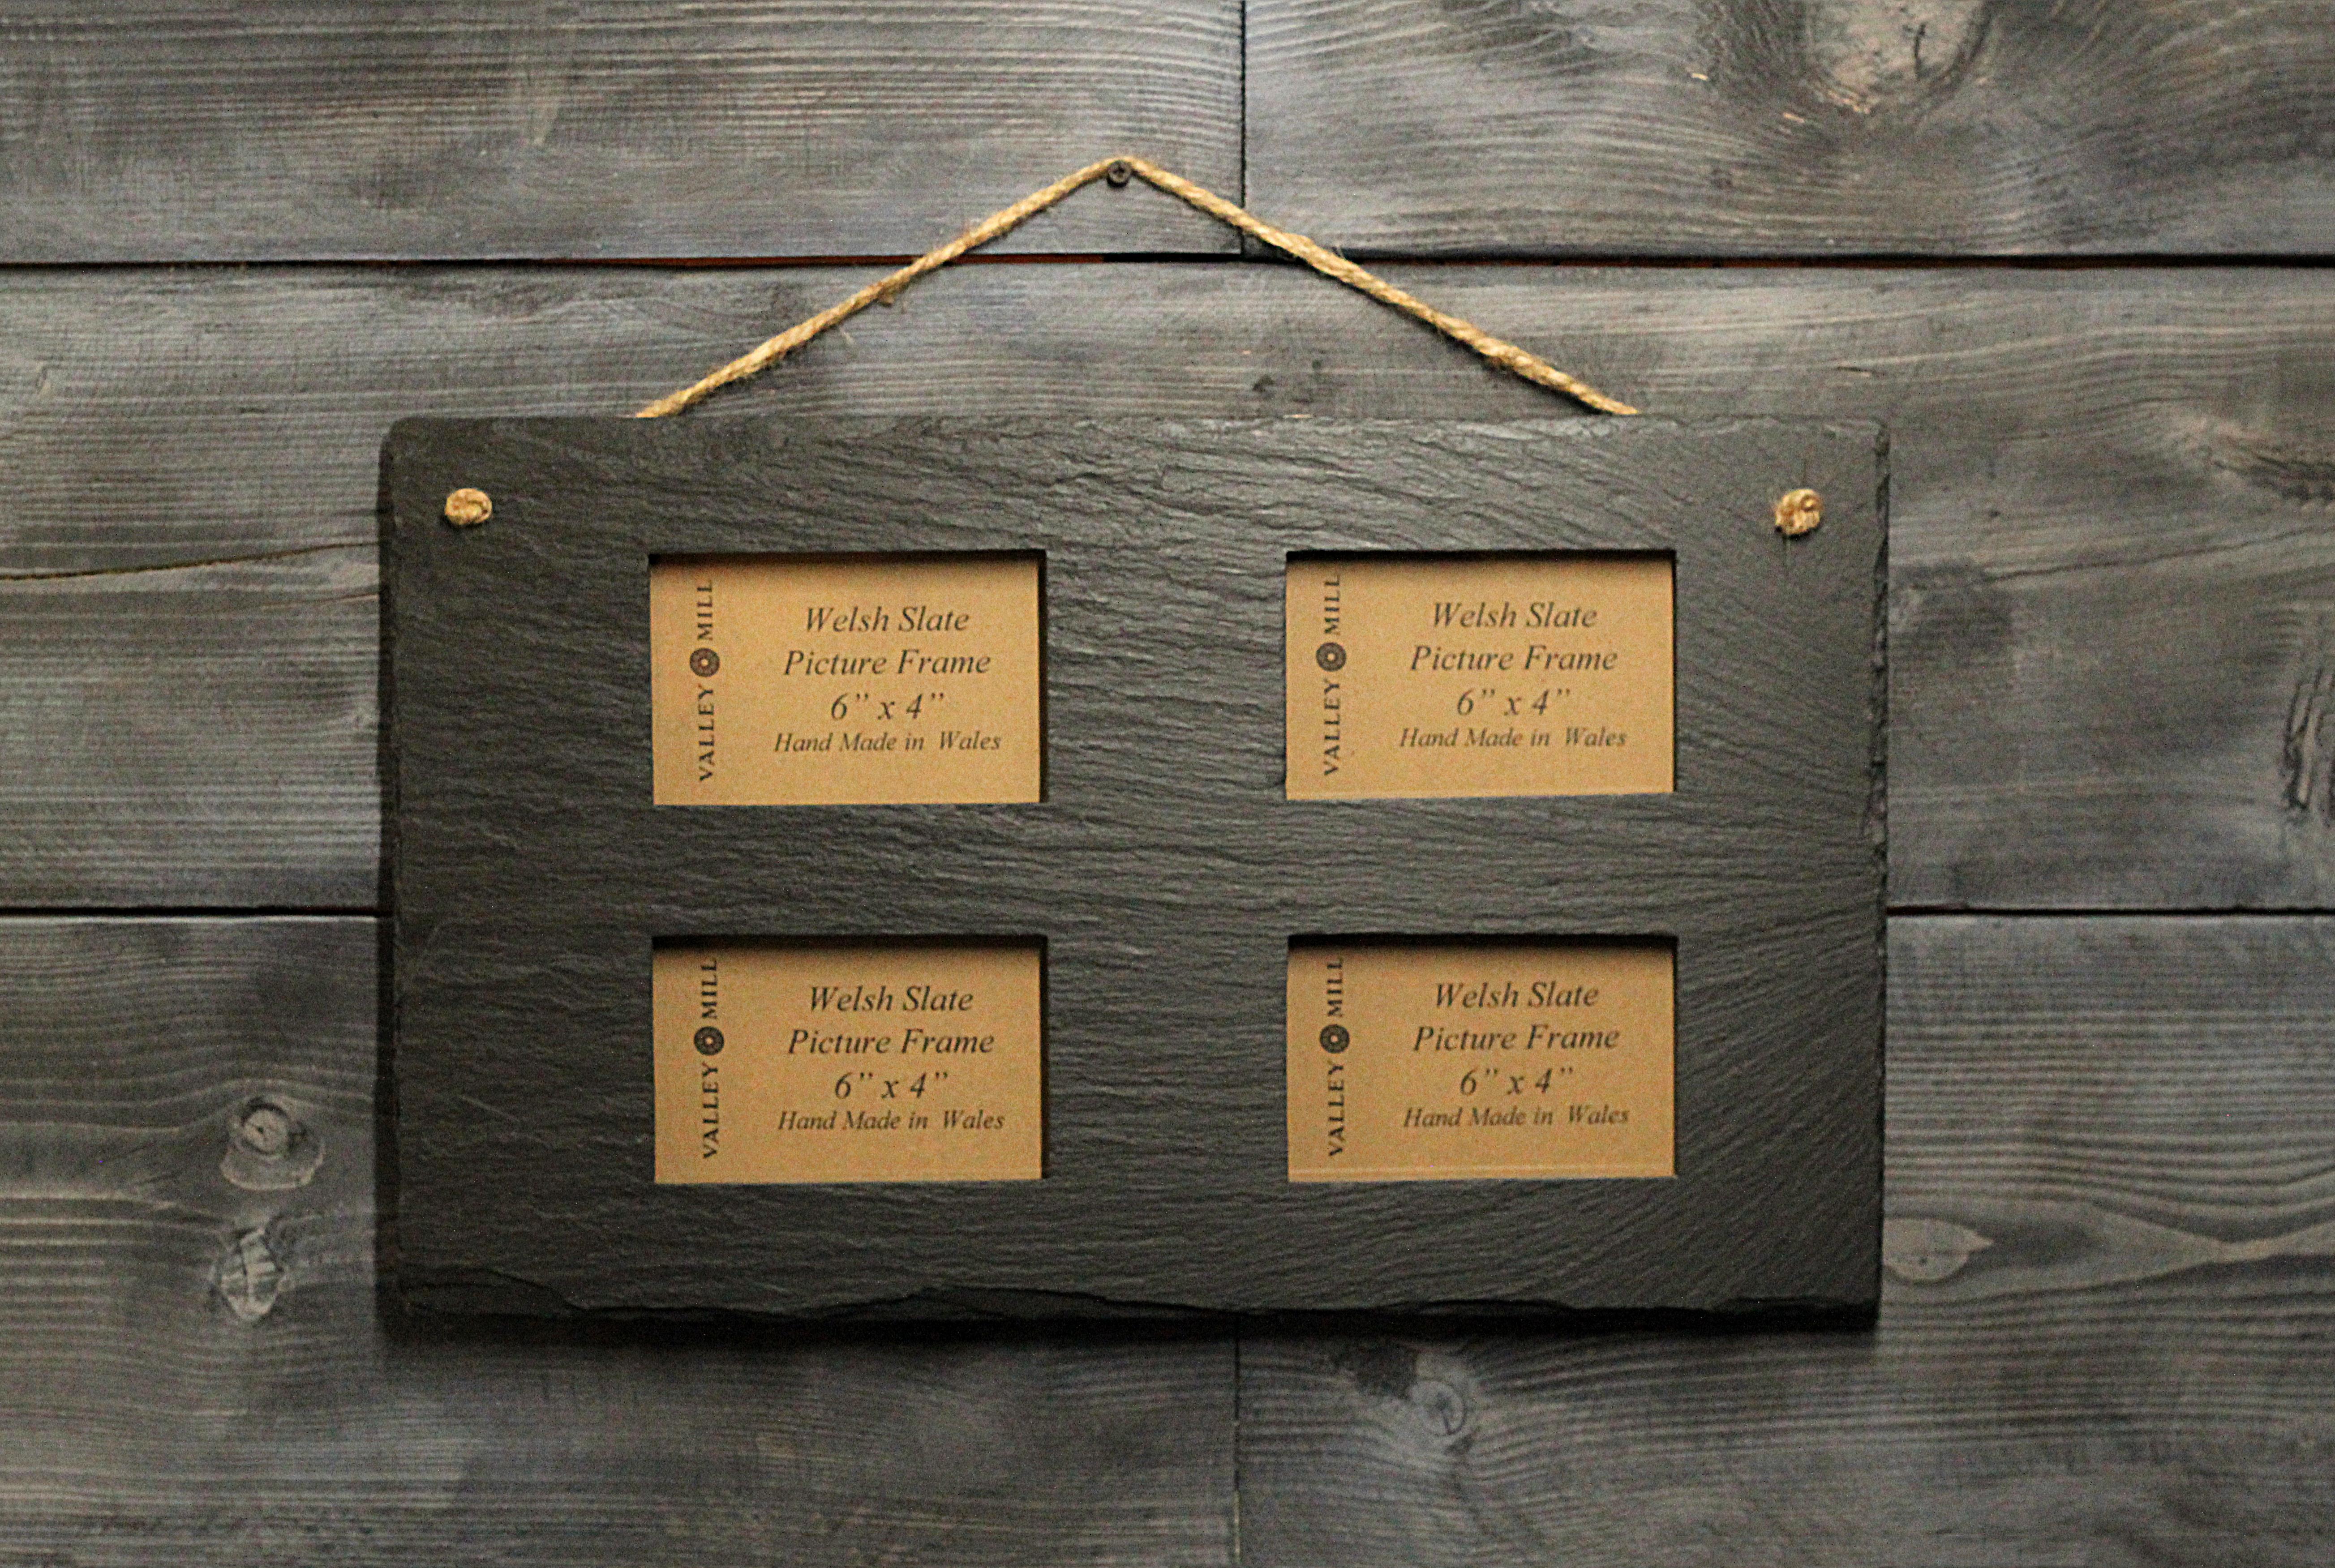 Welsh slate picture frame